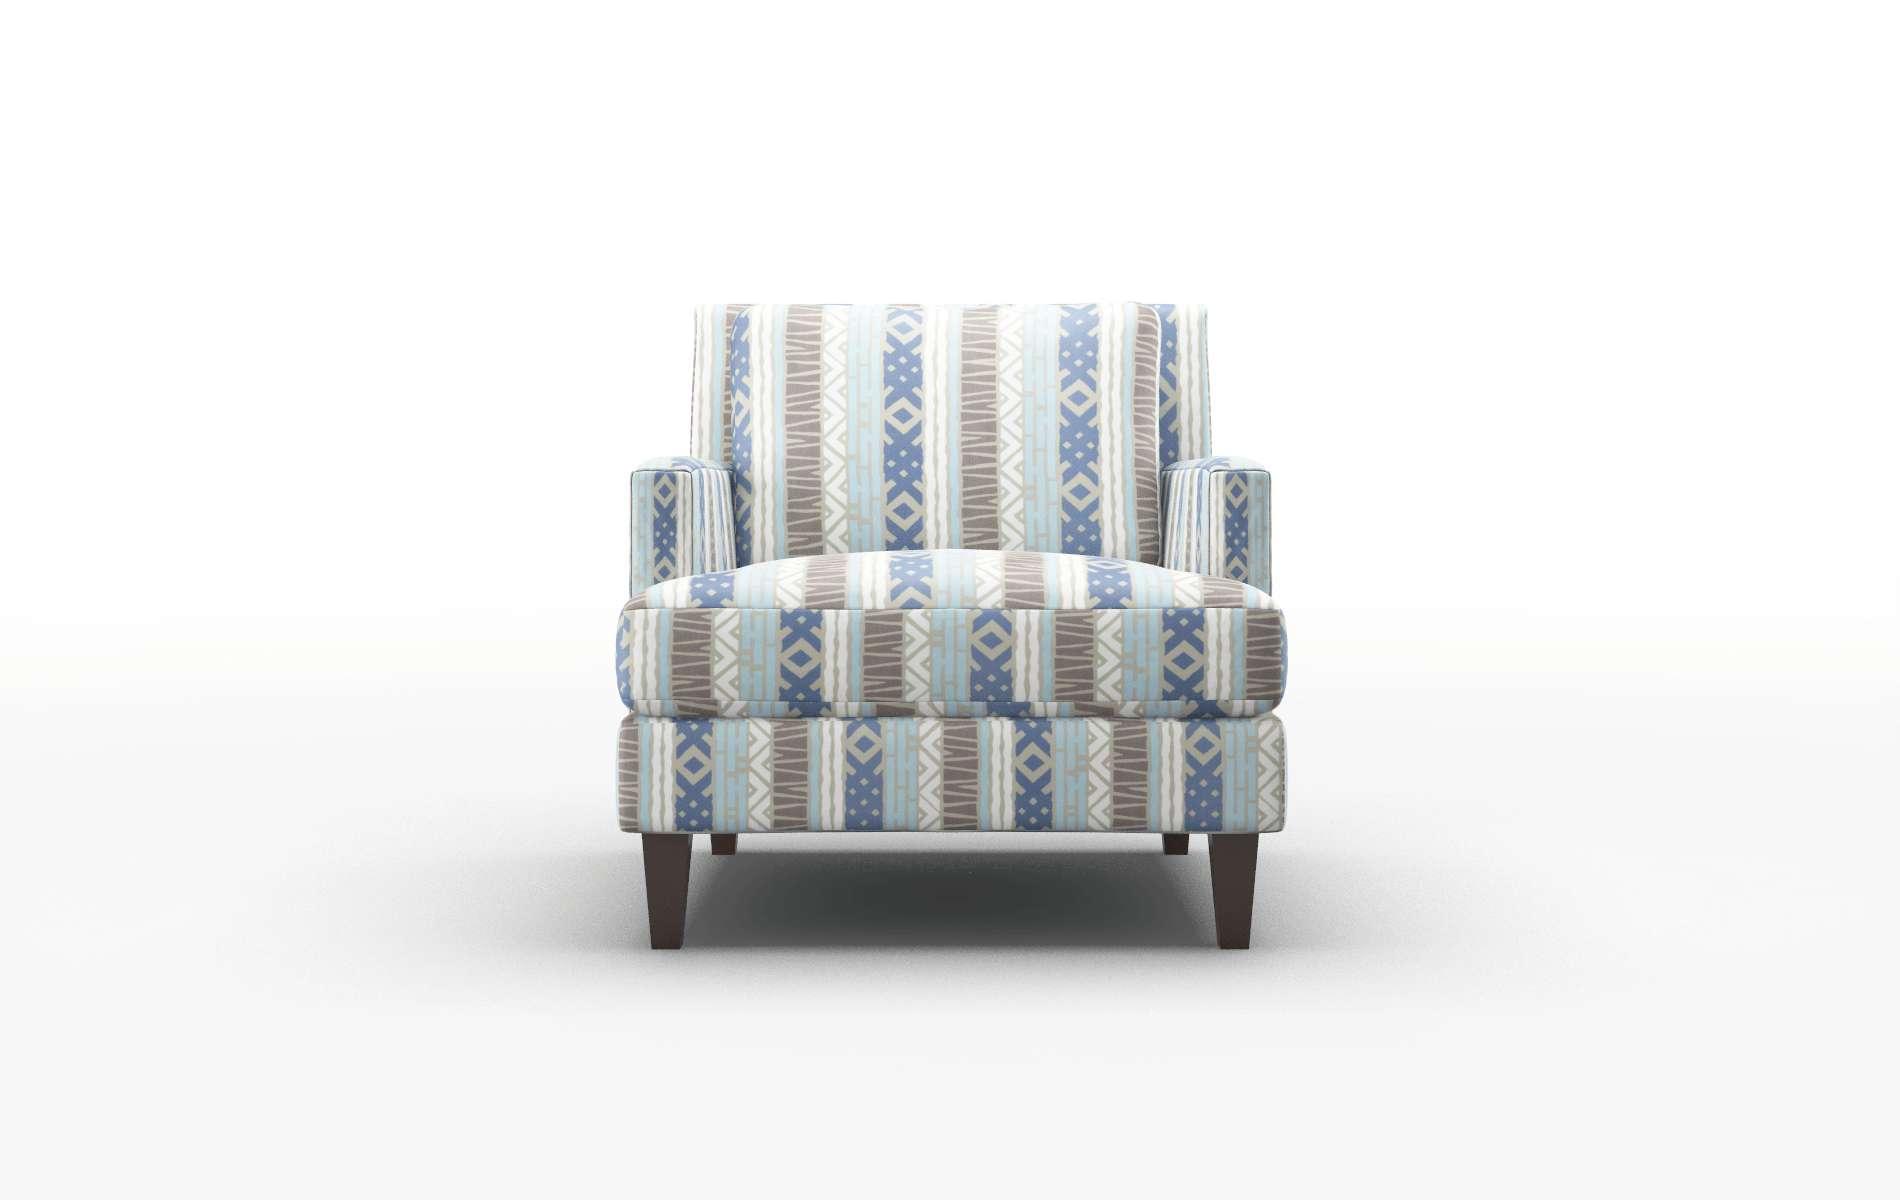 Marseille Bodhi Indigo Chair espresso legs 1